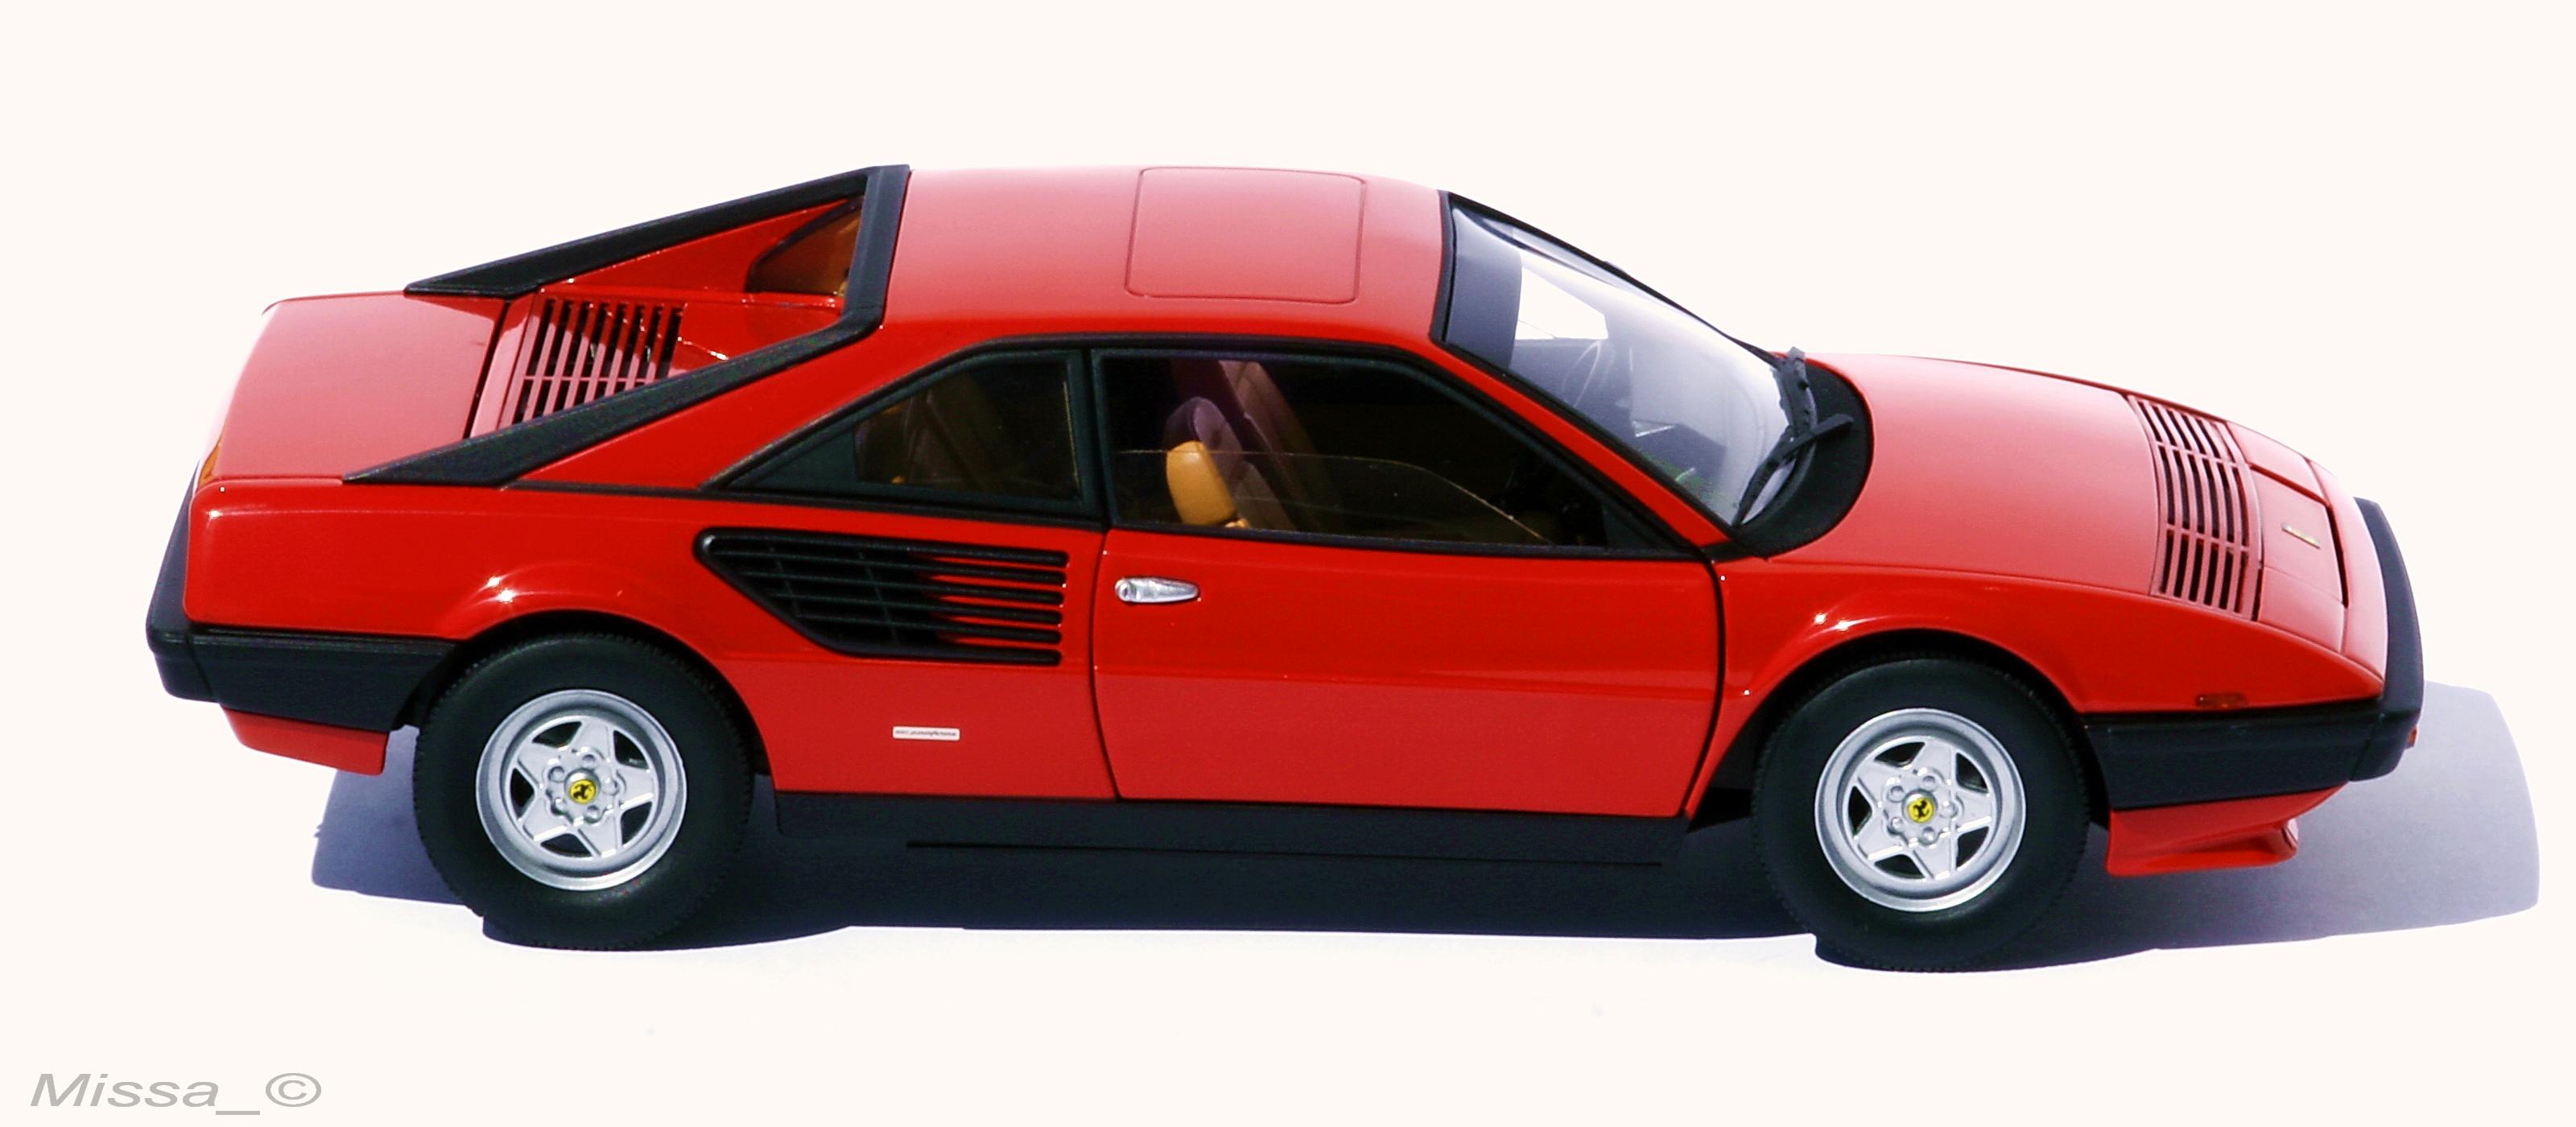 017_elite_ferrari_monxvlu2 Fabulous Ferrari Mondial 8 Super Elite Cars Trend